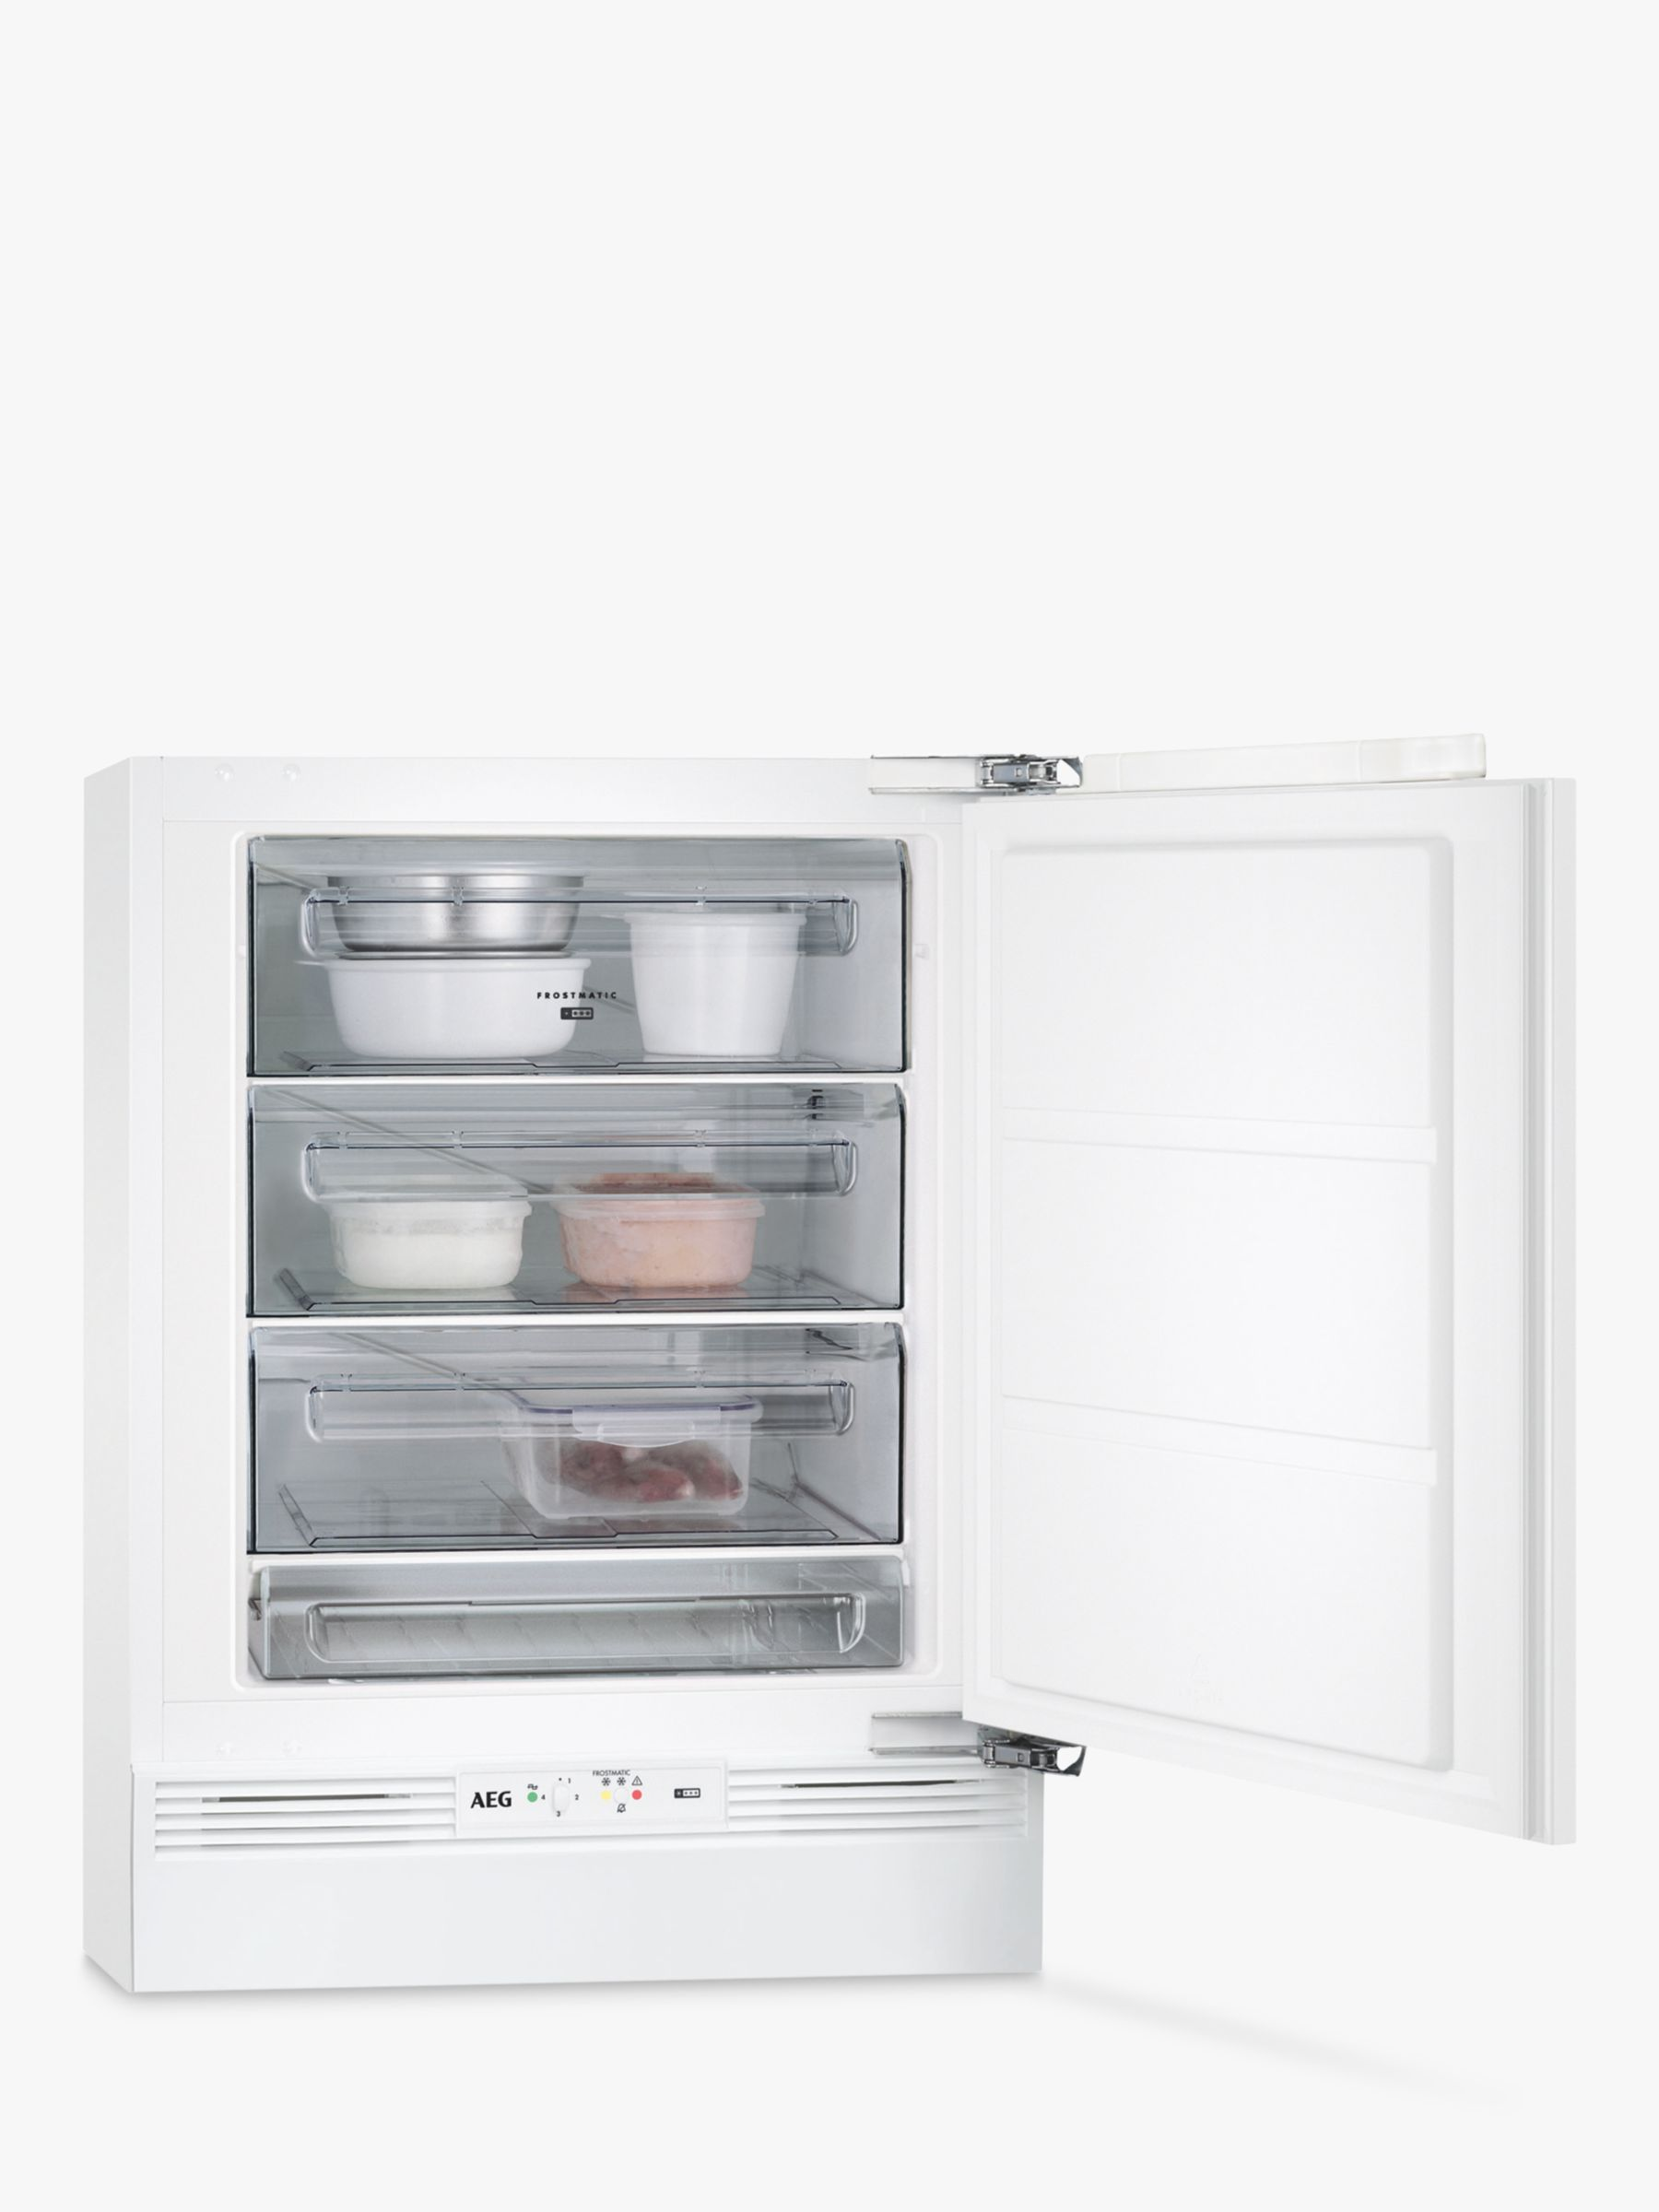 AEG AEG ABB6821VAF Built-Under Freezer, A+ Energy Rating, 60cm Wide, White